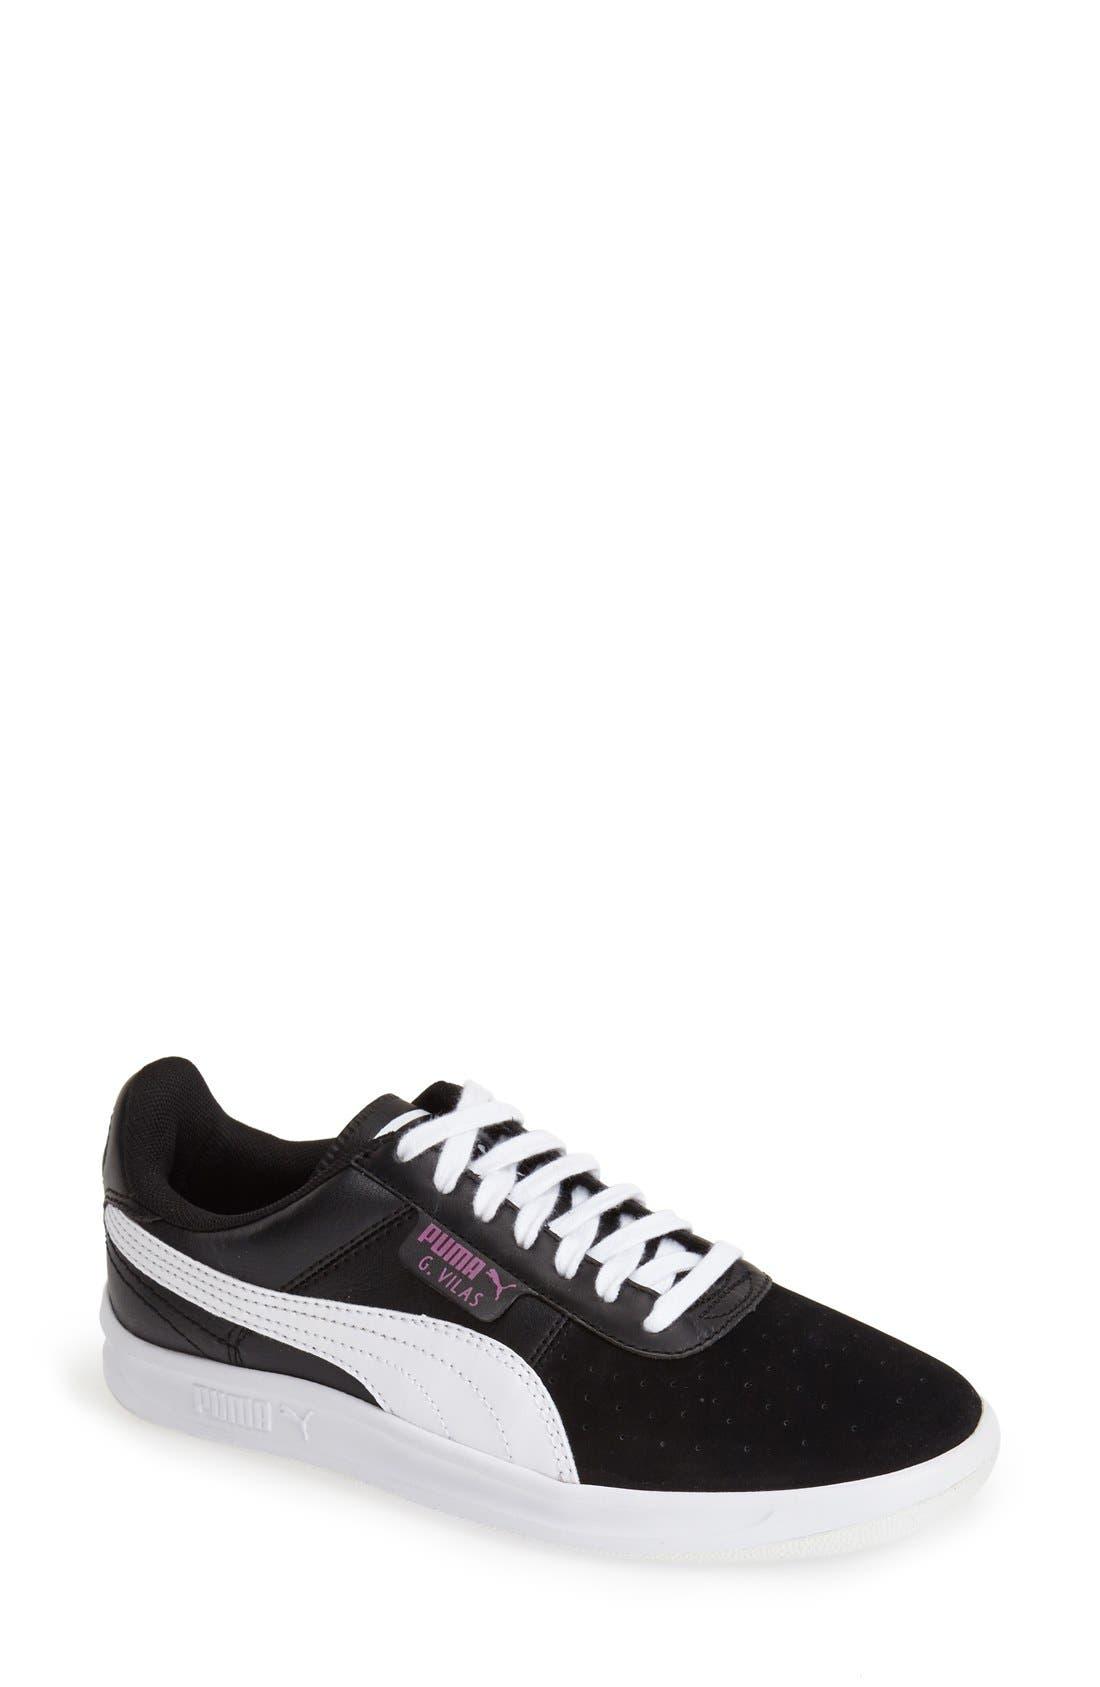 Alternate Image 1 Selected - PUMA 'G. Vilas - Basic Sport' Sneaker (Women)